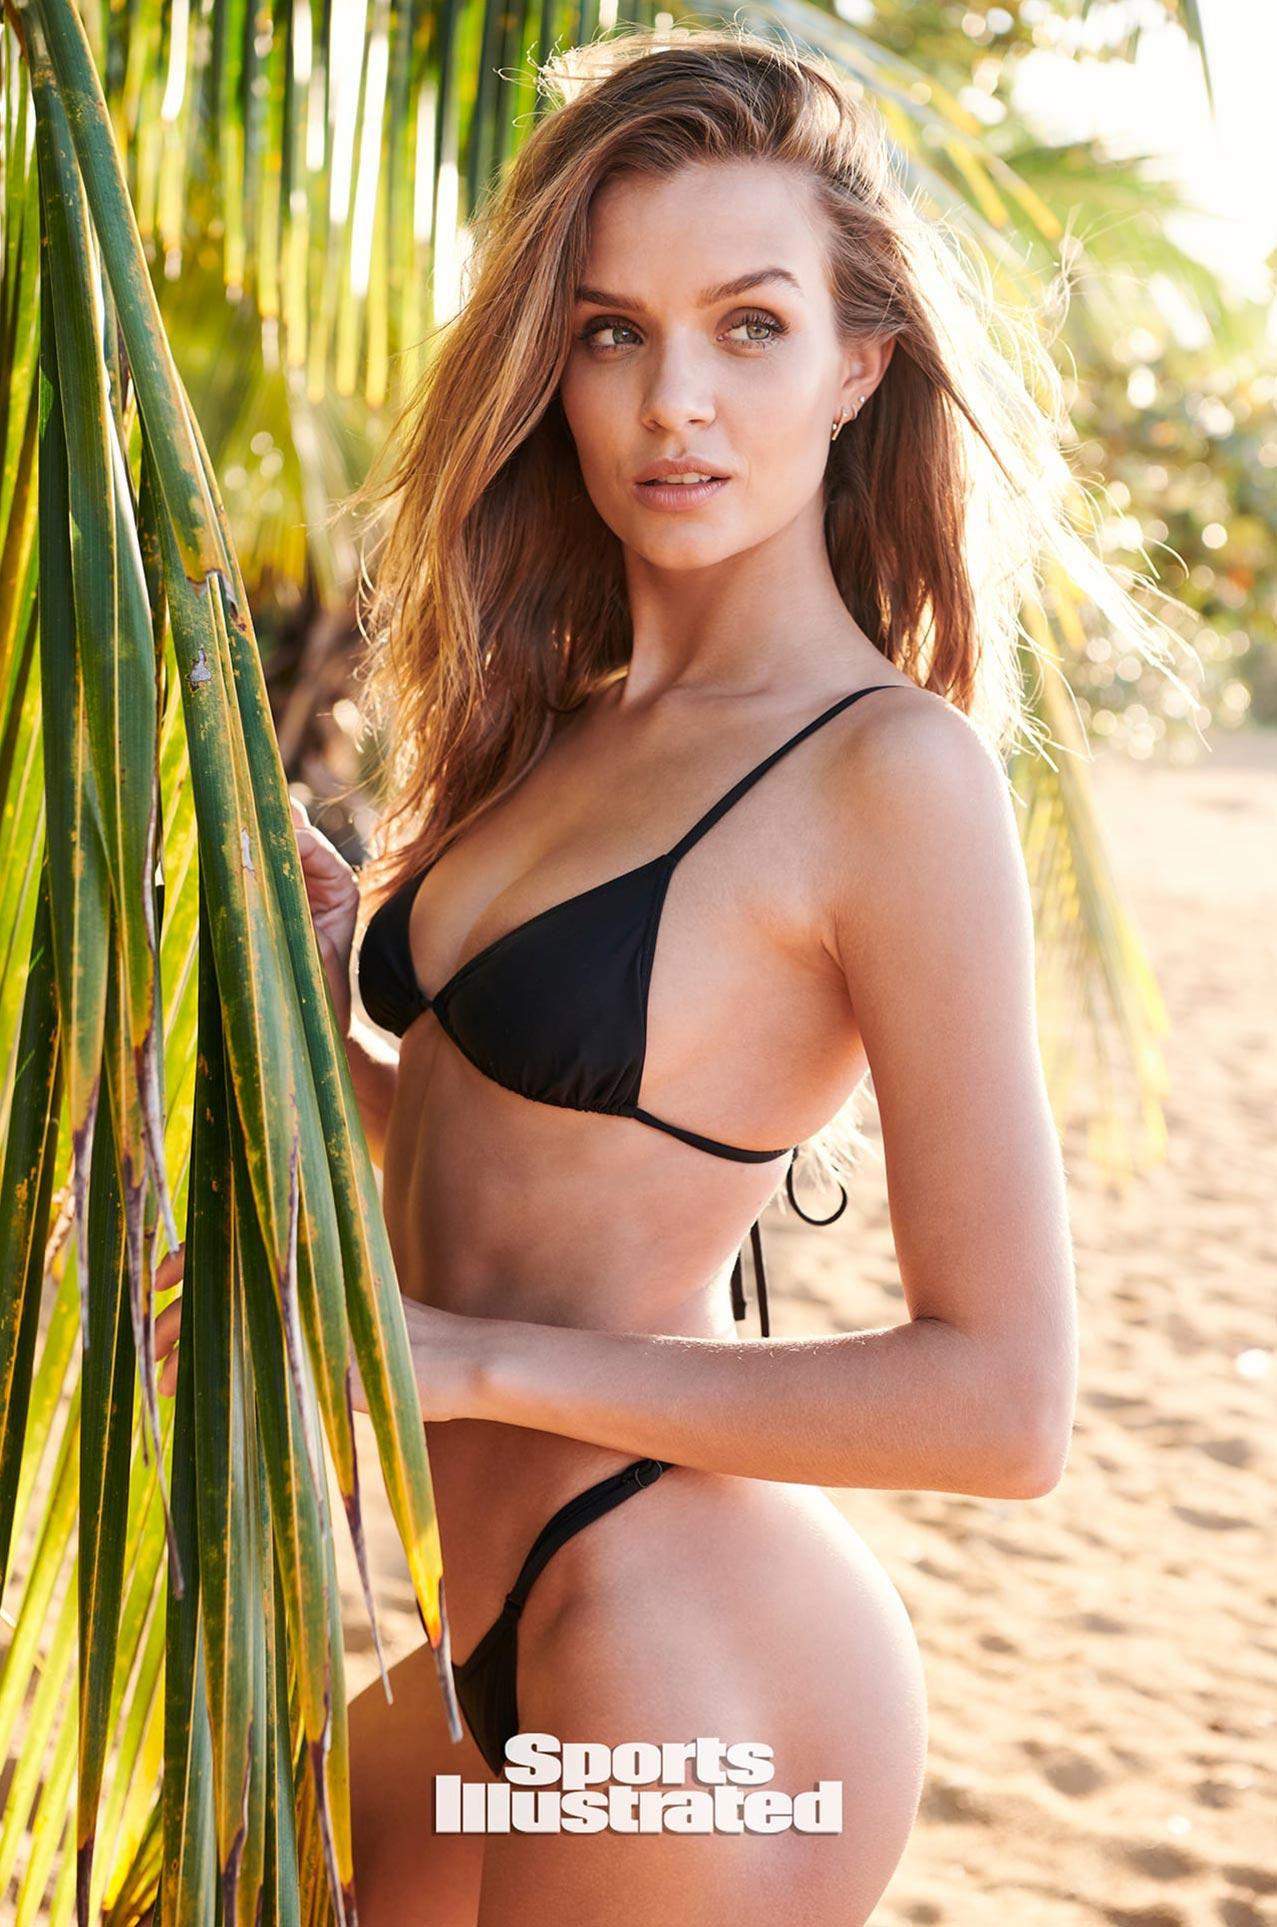 Жозефин Скривер в каталоге купальников Sports Illustrated Swimsuit 2020 / фото 06